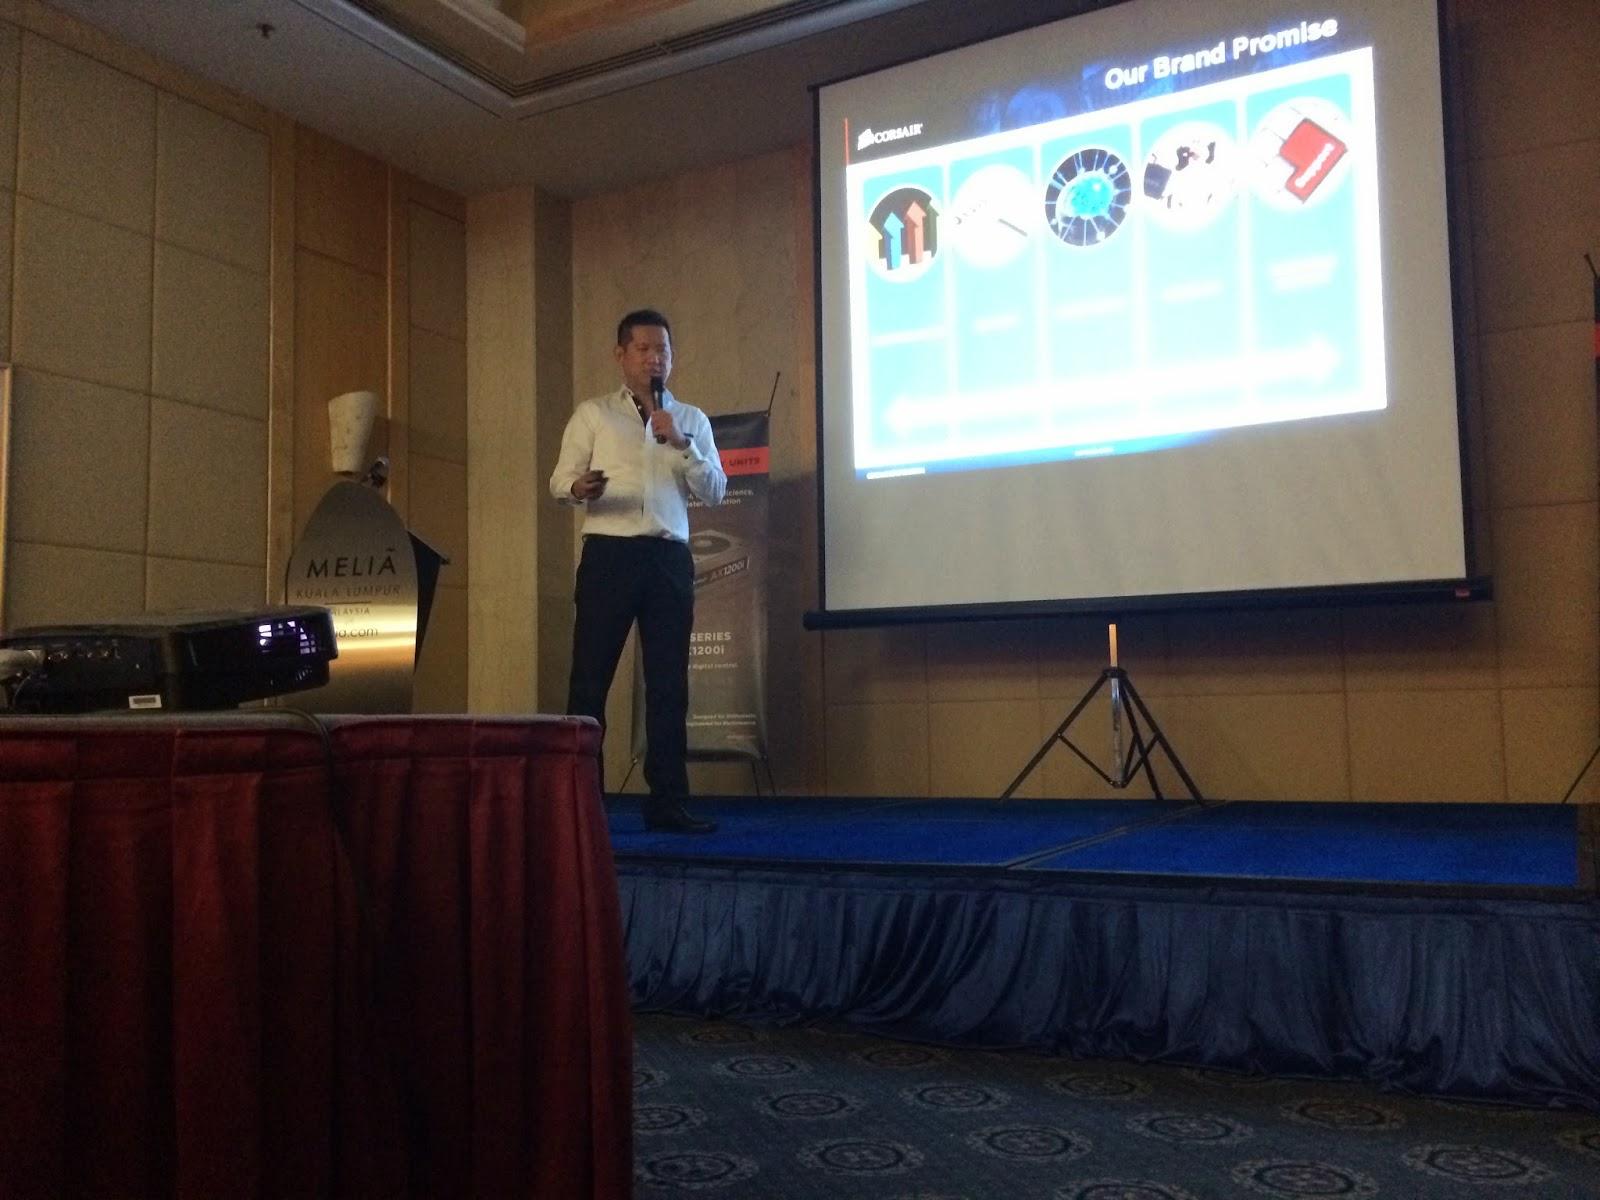 Coverage of Corsair Event @Melia Kuala Lumpur 73